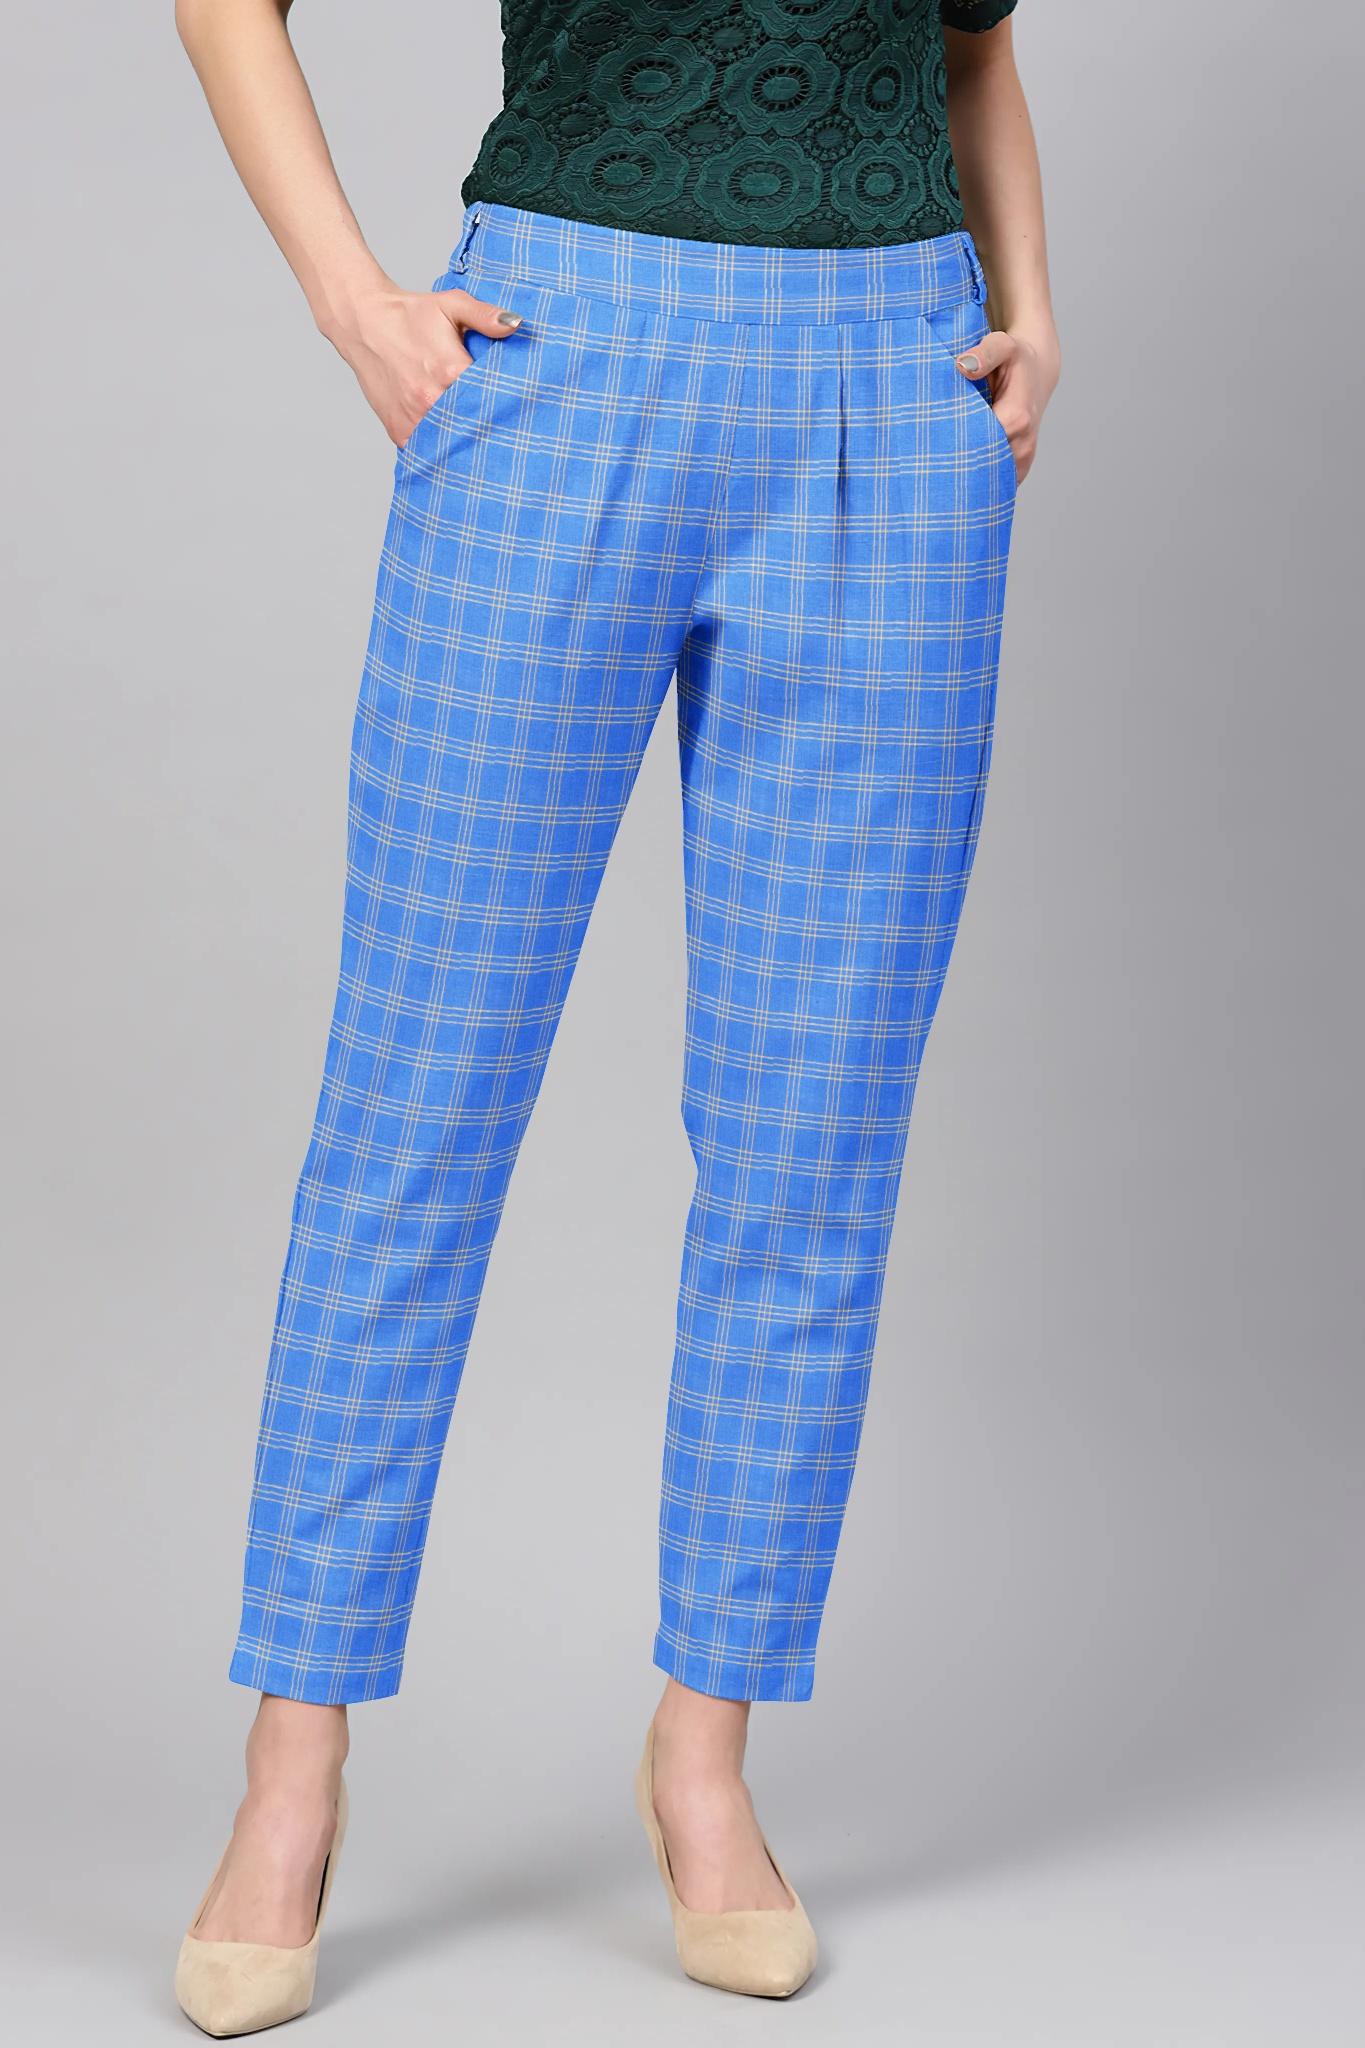 /home/customer/www/fabartcraft.com/public_html/uploadshttps://www.shopolics.com/uploads/images/medium/Blue-Cream-Cotton-Check-Regular-Fit-Solid-Trouser-36114.jpg